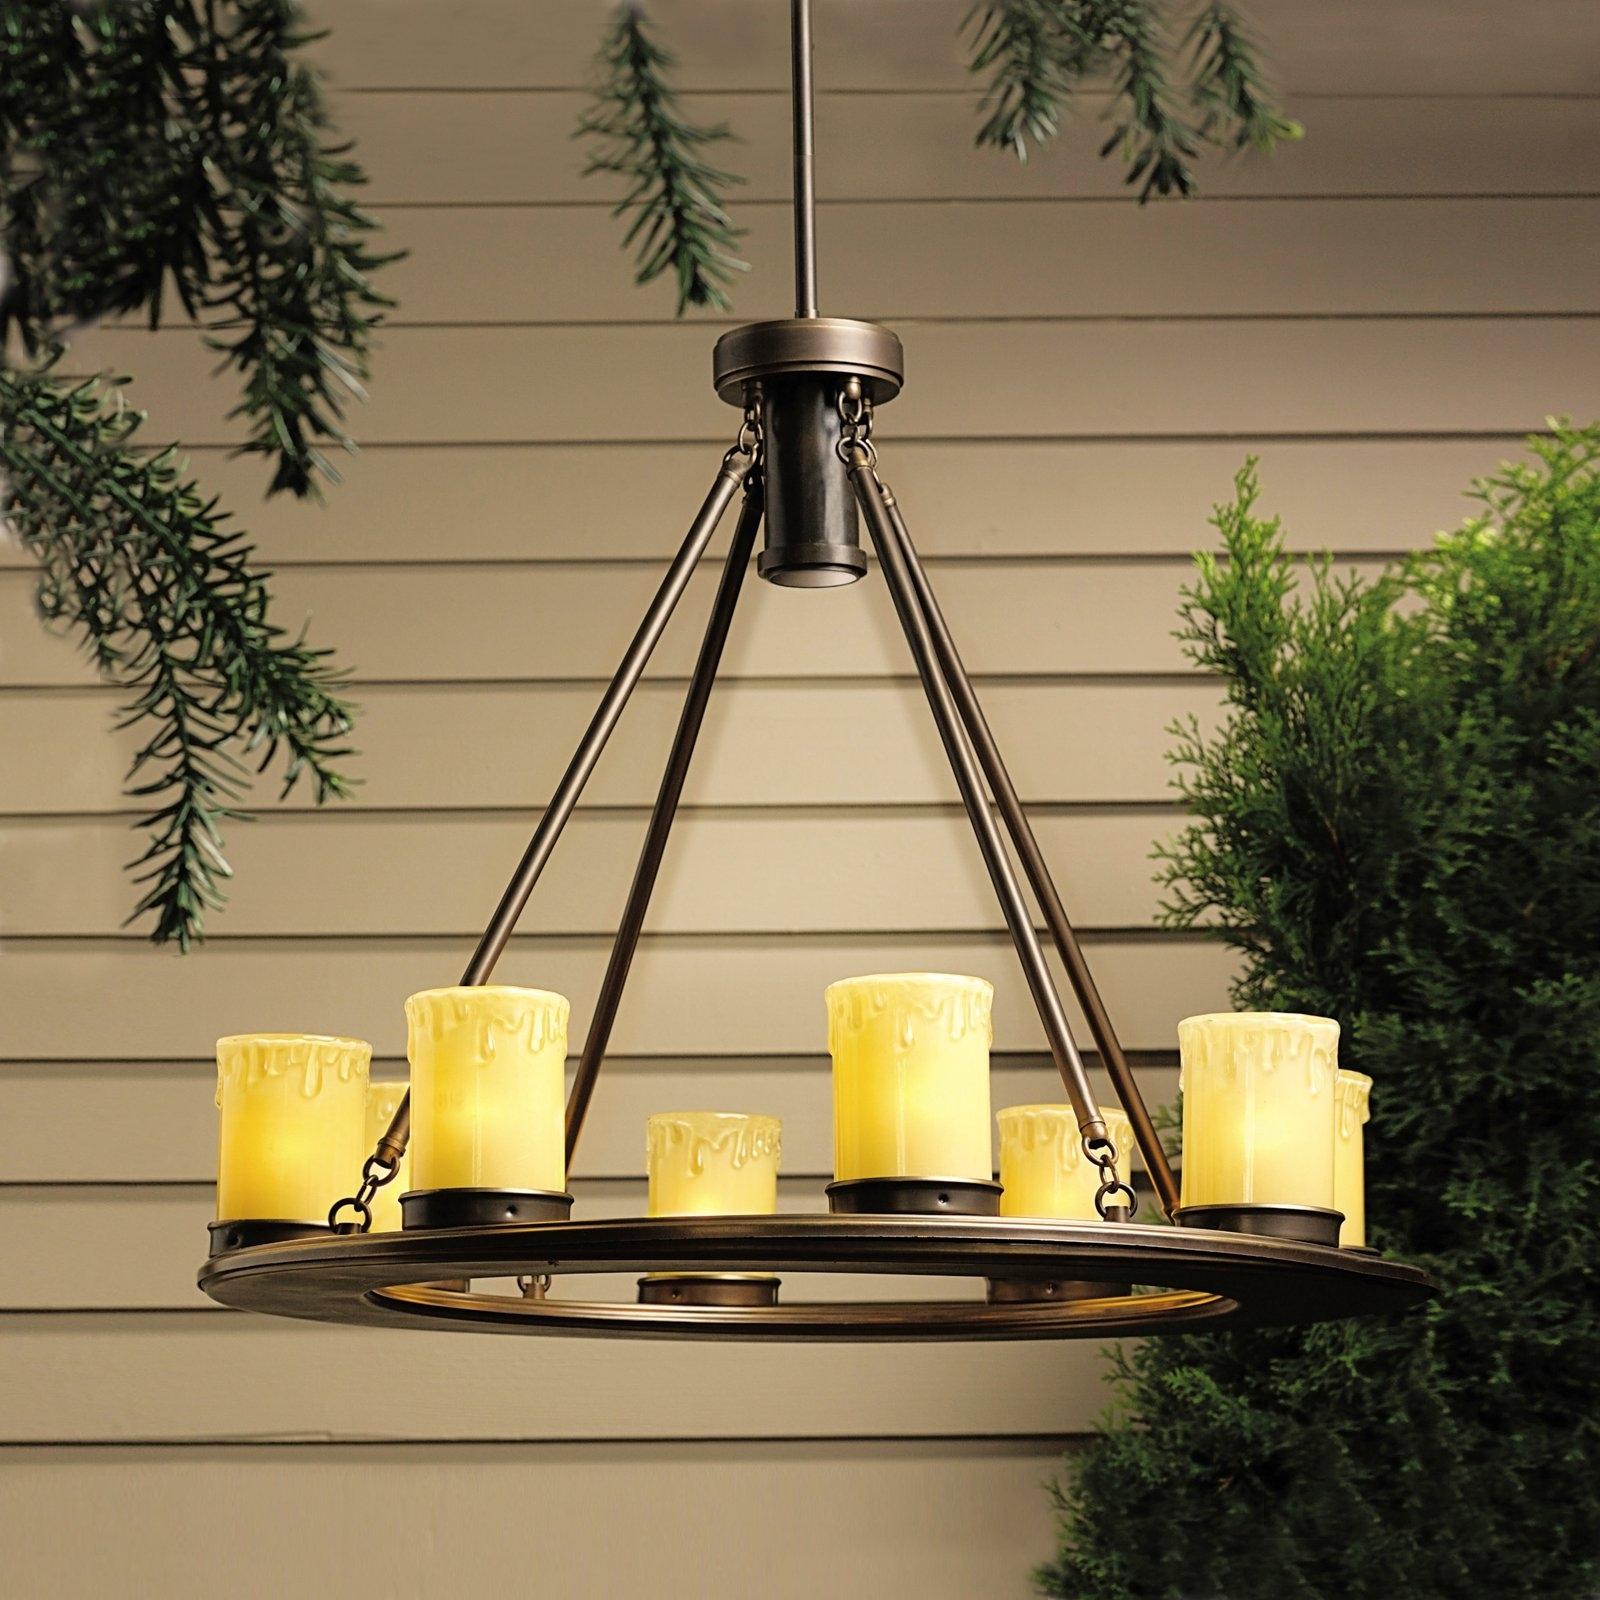 Kichler Oak Trail™ 12 Volt Outdoor Chandelier – Walmart With Regard To Latest Outdoor Chandelier Kichler Lighting (View 11 of 20)